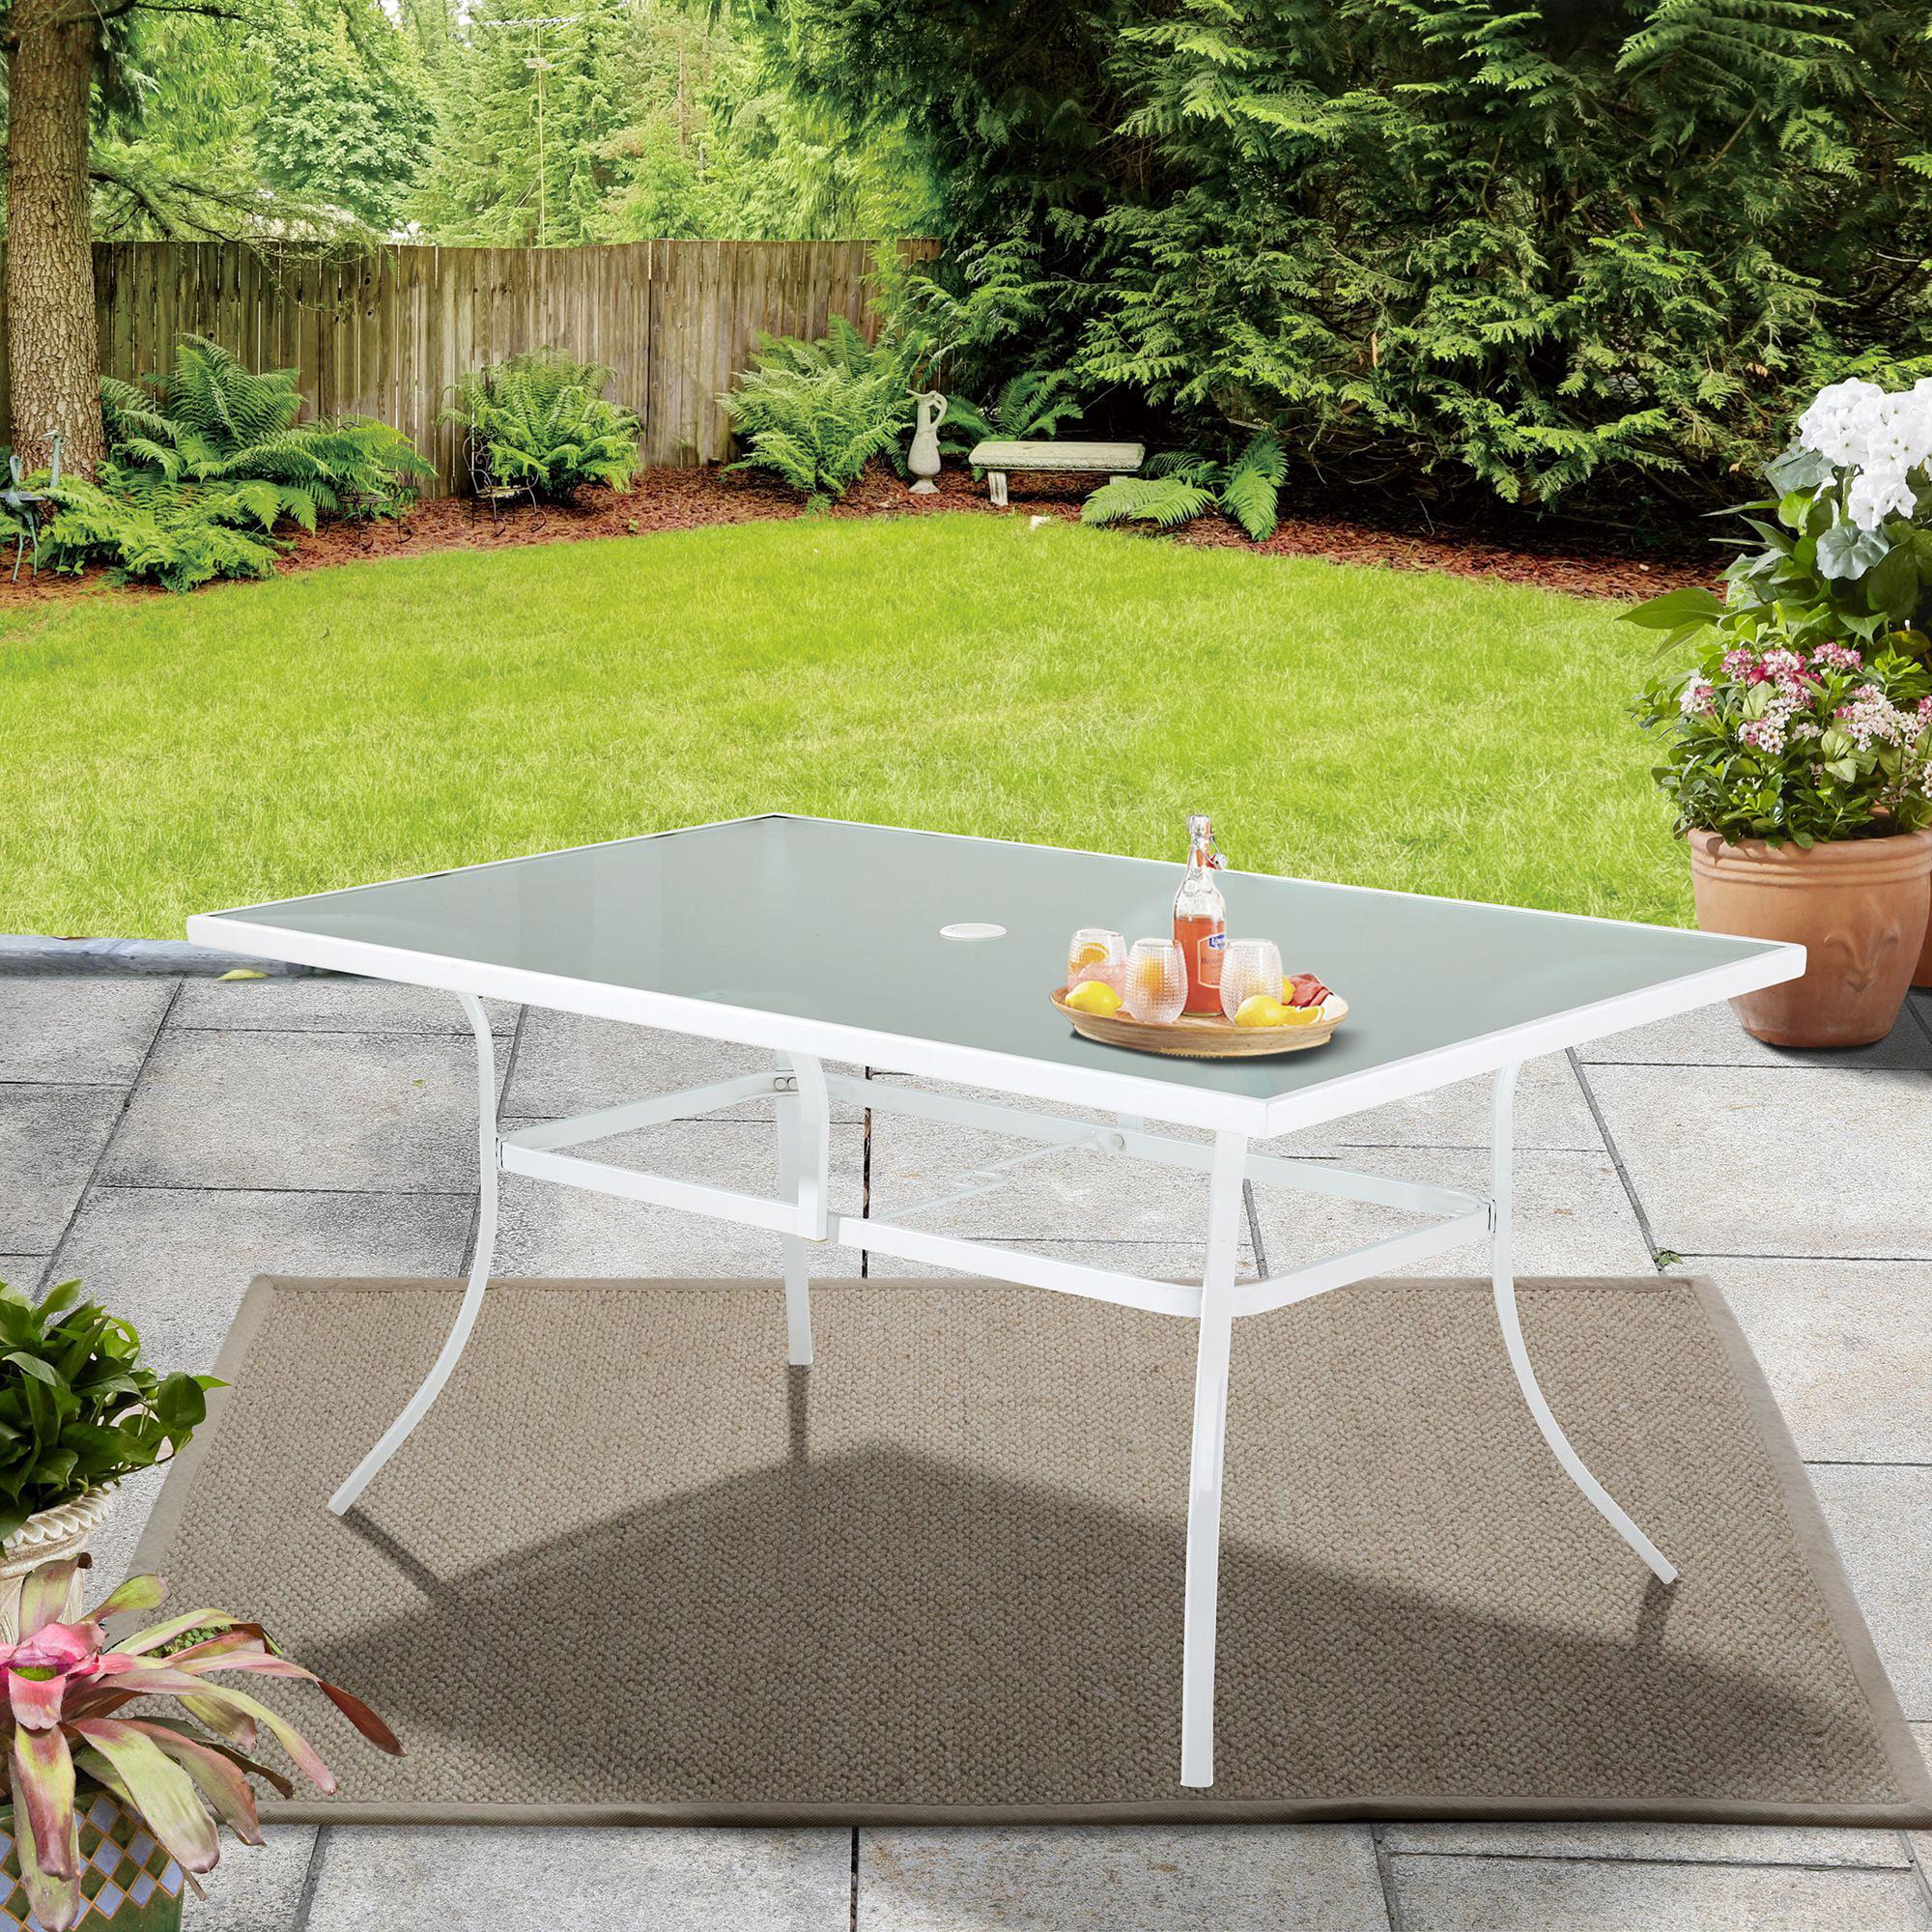 Mainstays 60 Rectangle Glass Top Outdoor Patio Dining Table White Walmart Com Walmart Com